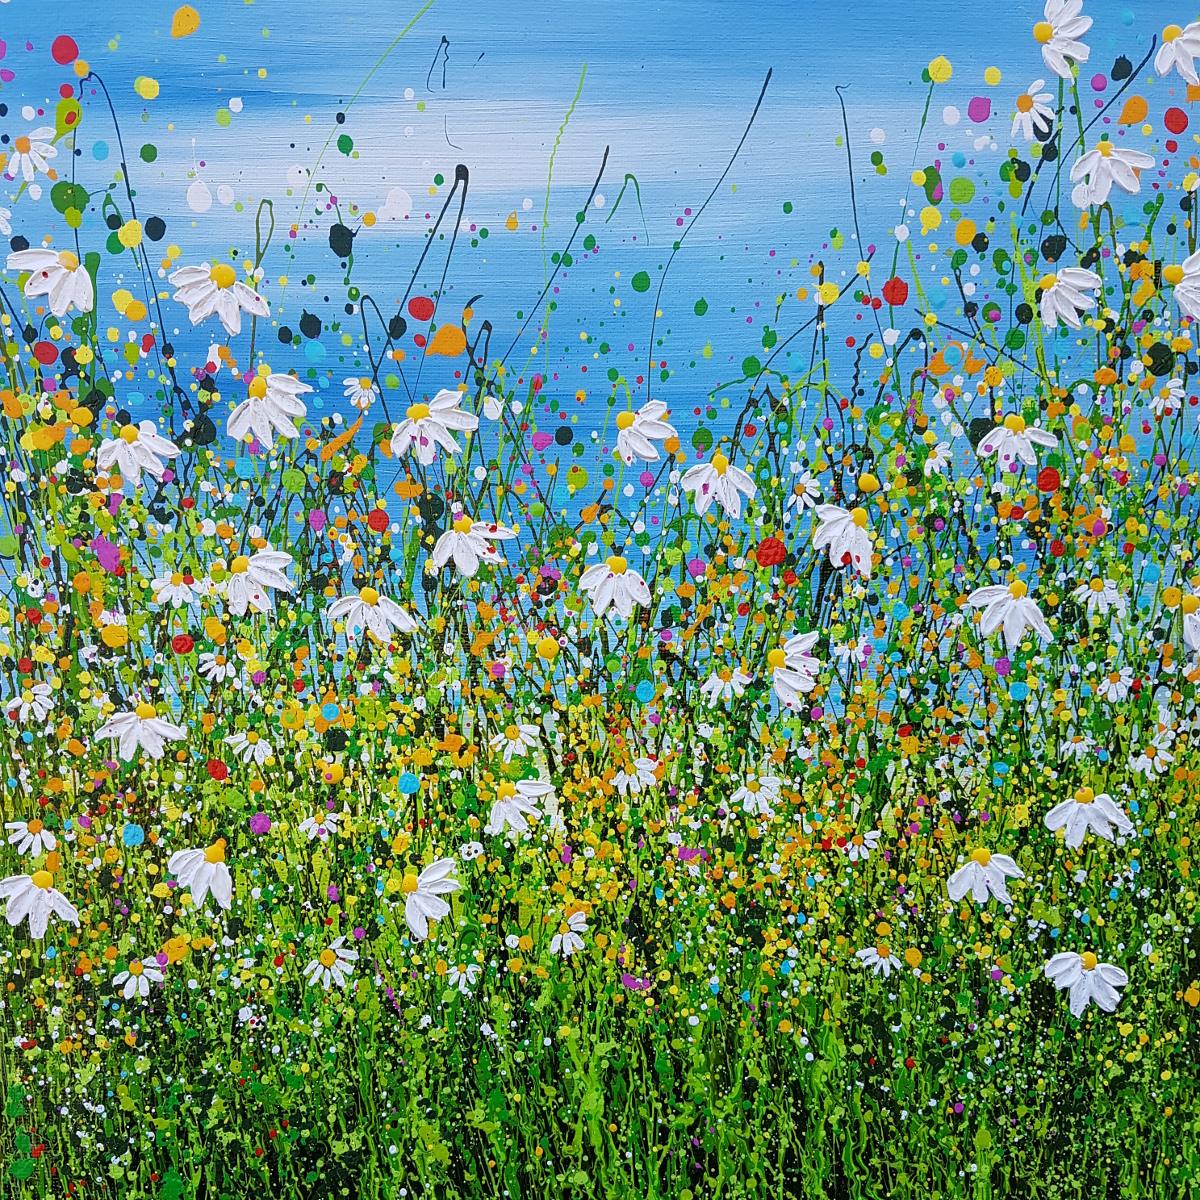 Delightful Daisy Meadows